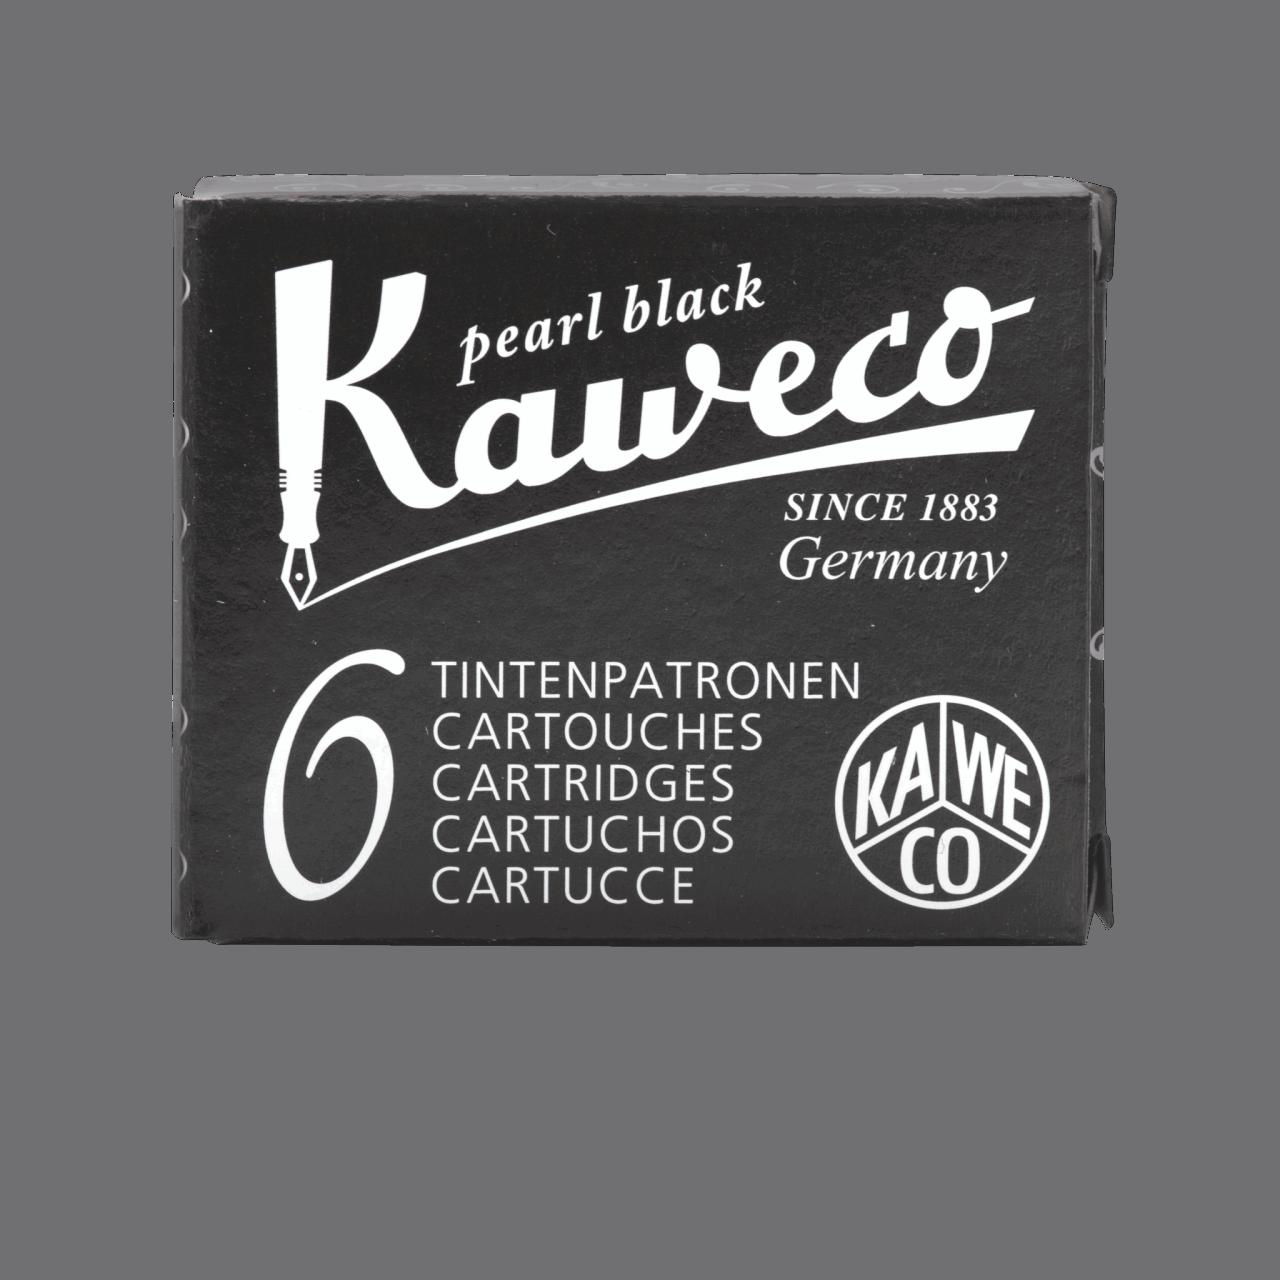 Kaweco Tintenpatronen 6 Stück - Perlen Schwarz